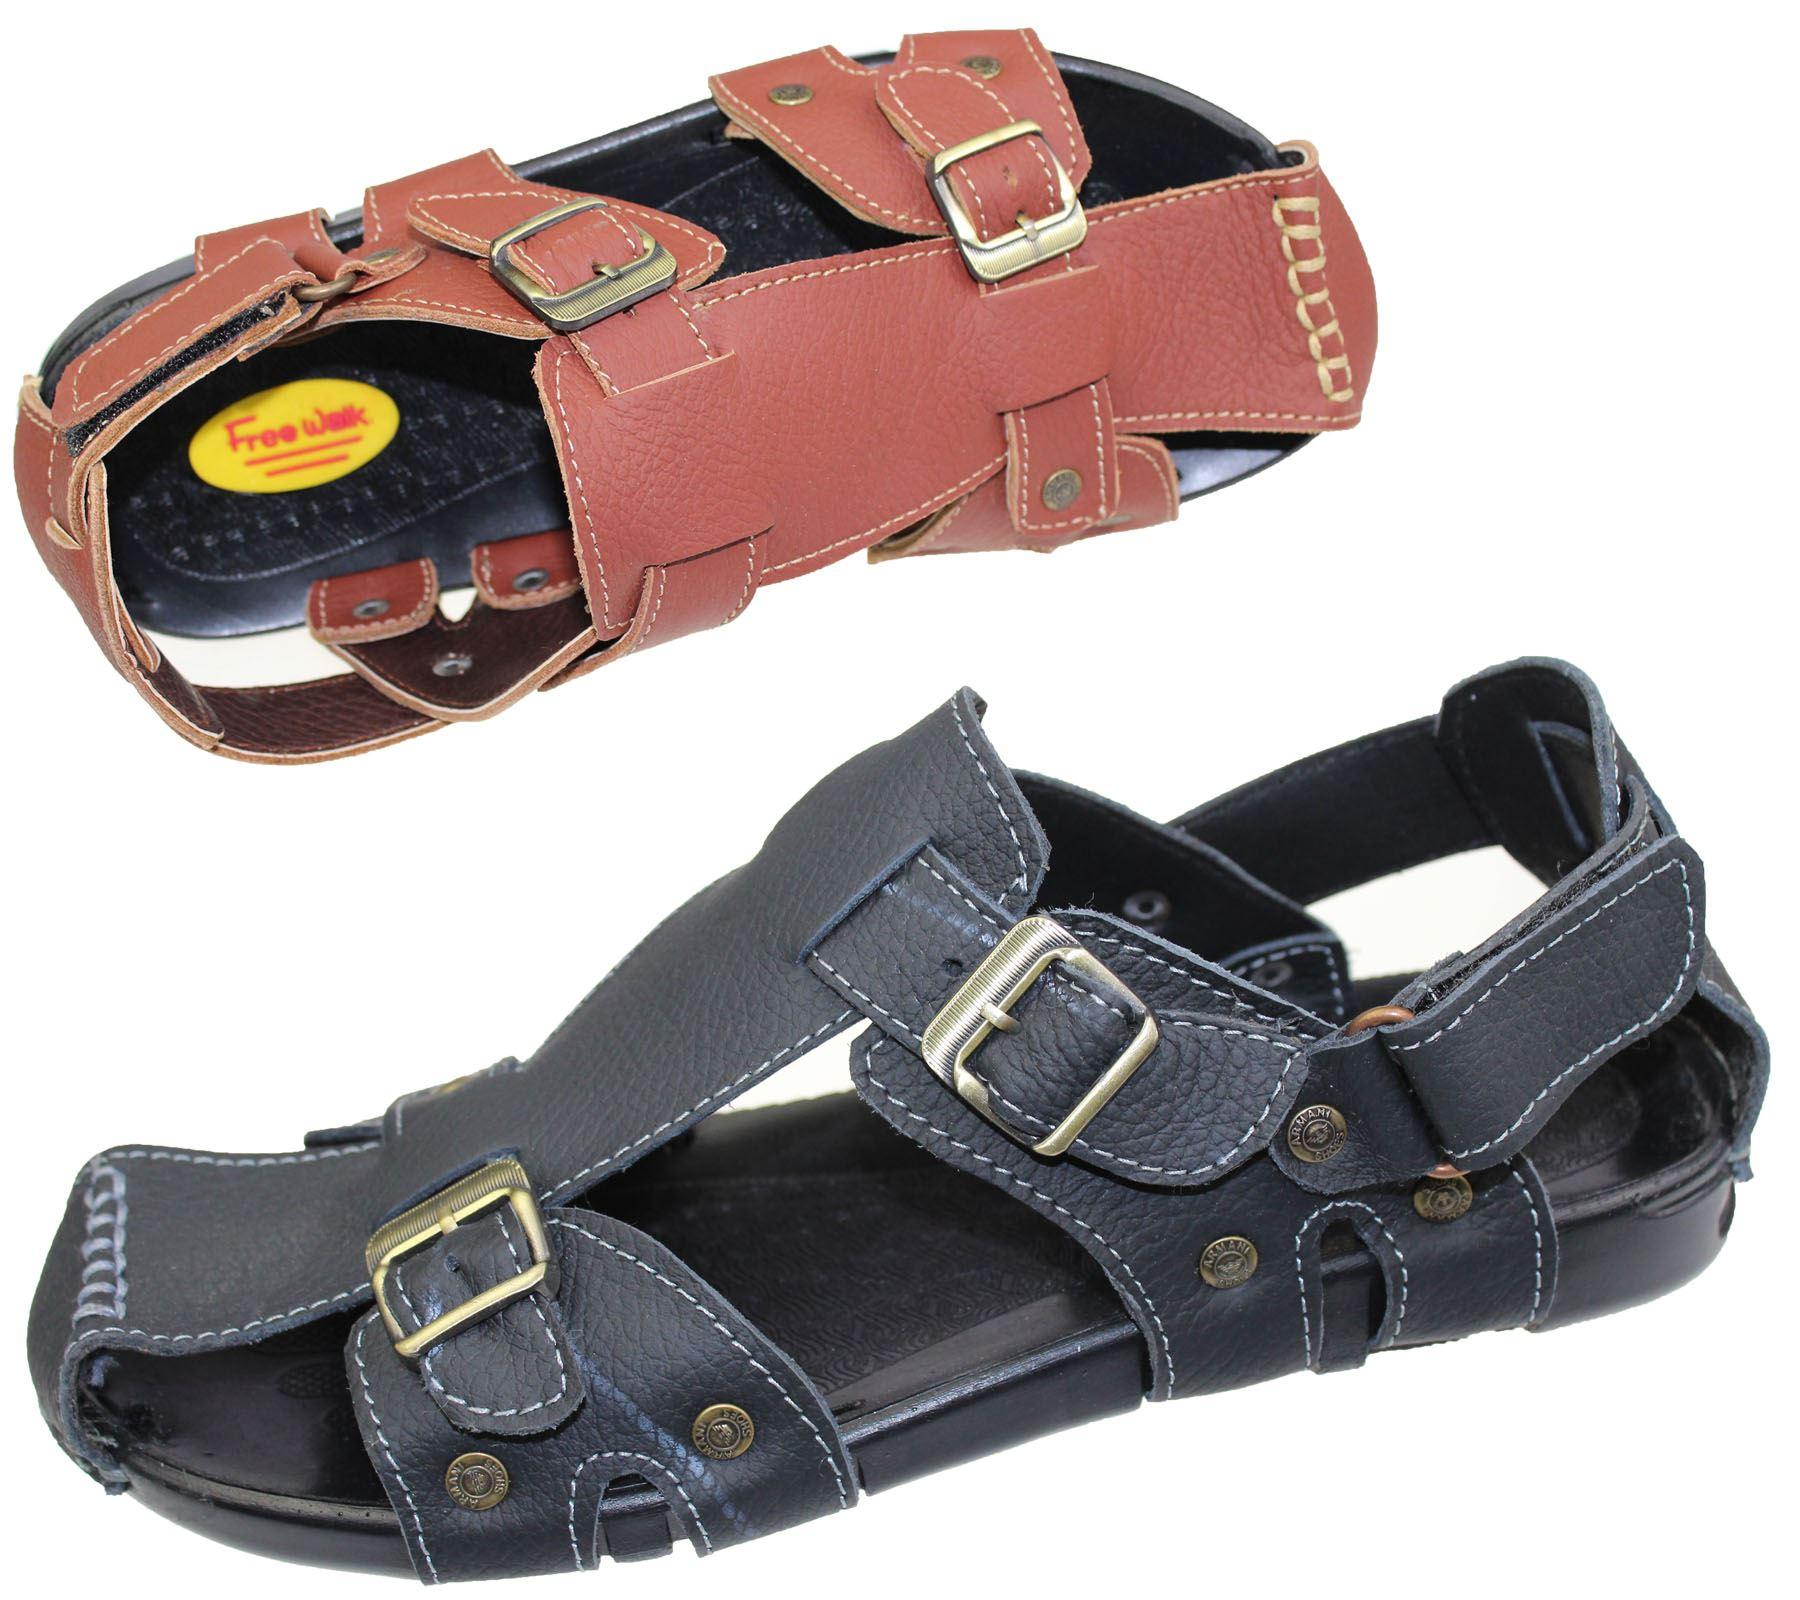 jungen m nner schnalle sport sandalen komfort wandern sommer strand pantolette ebay. Black Bedroom Furniture Sets. Home Design Ideas